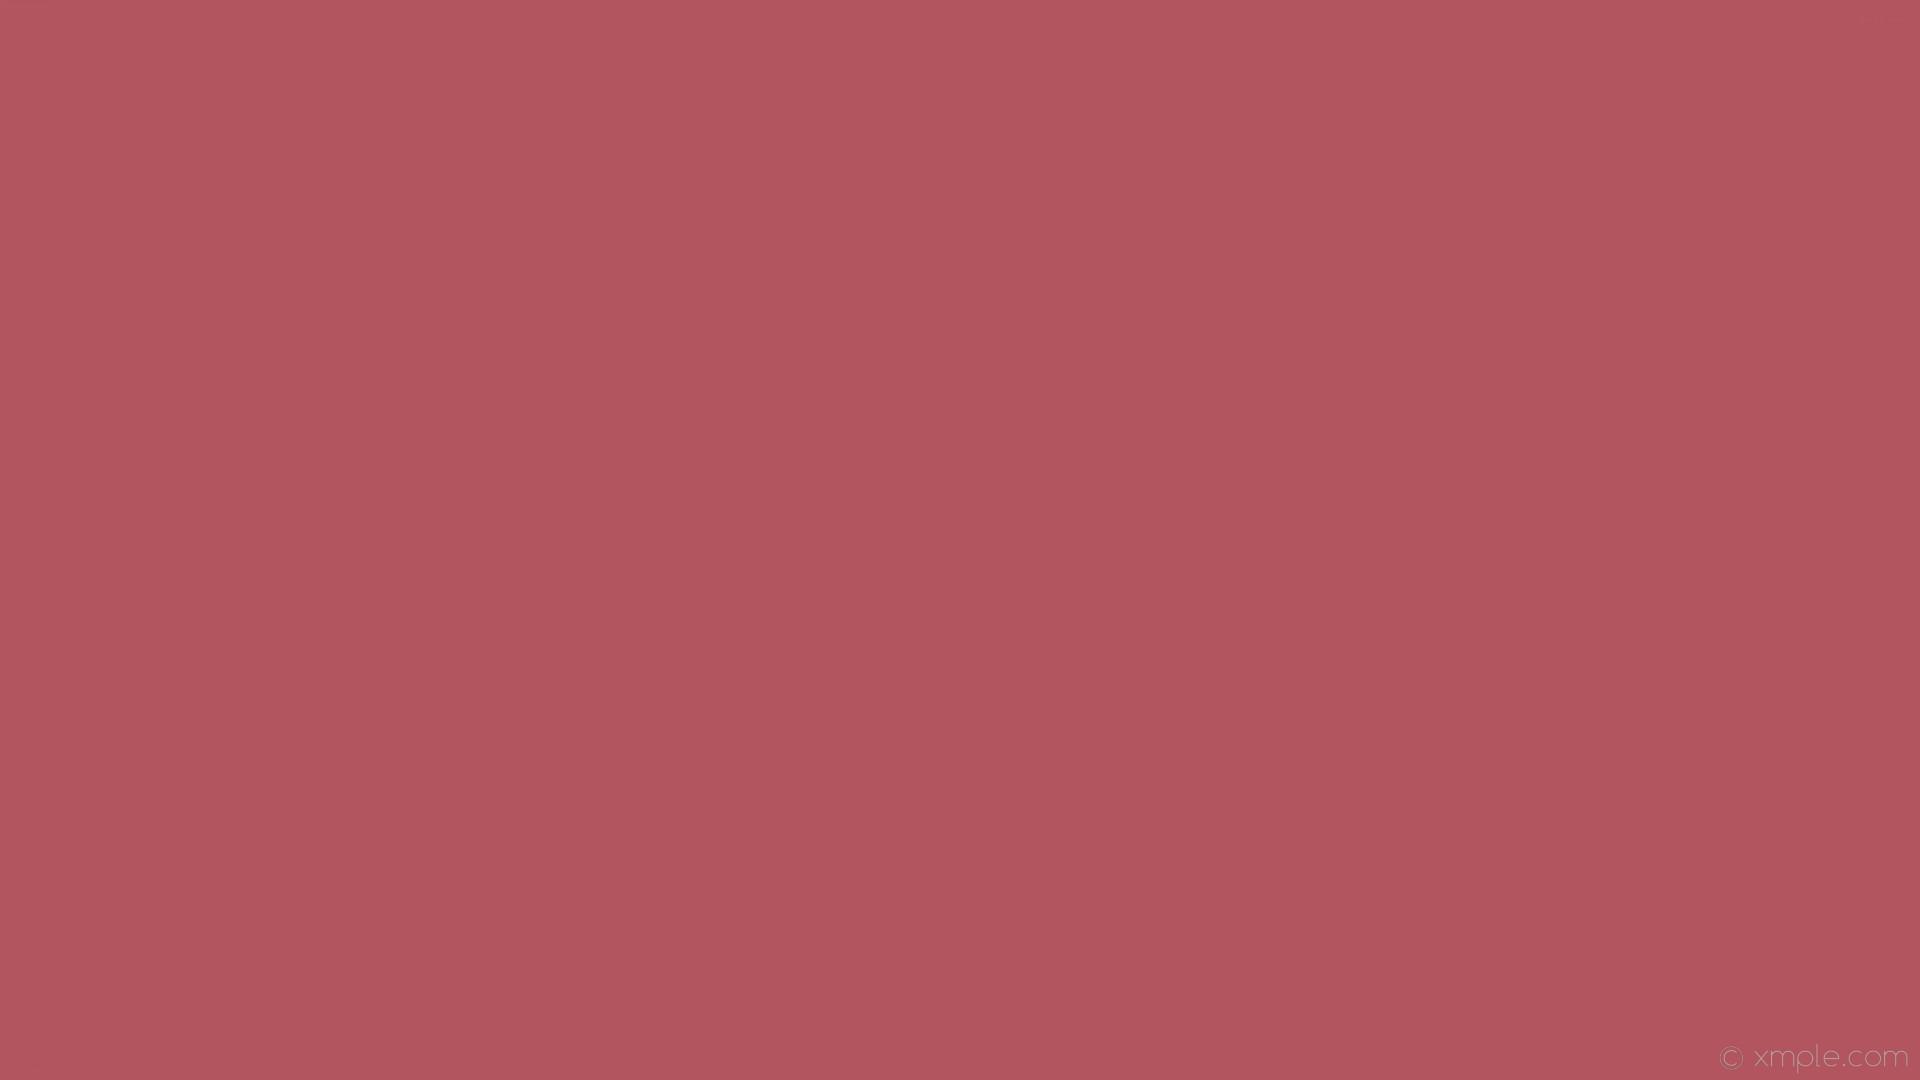 wallpaper one colour plain solid color red single #b2555e